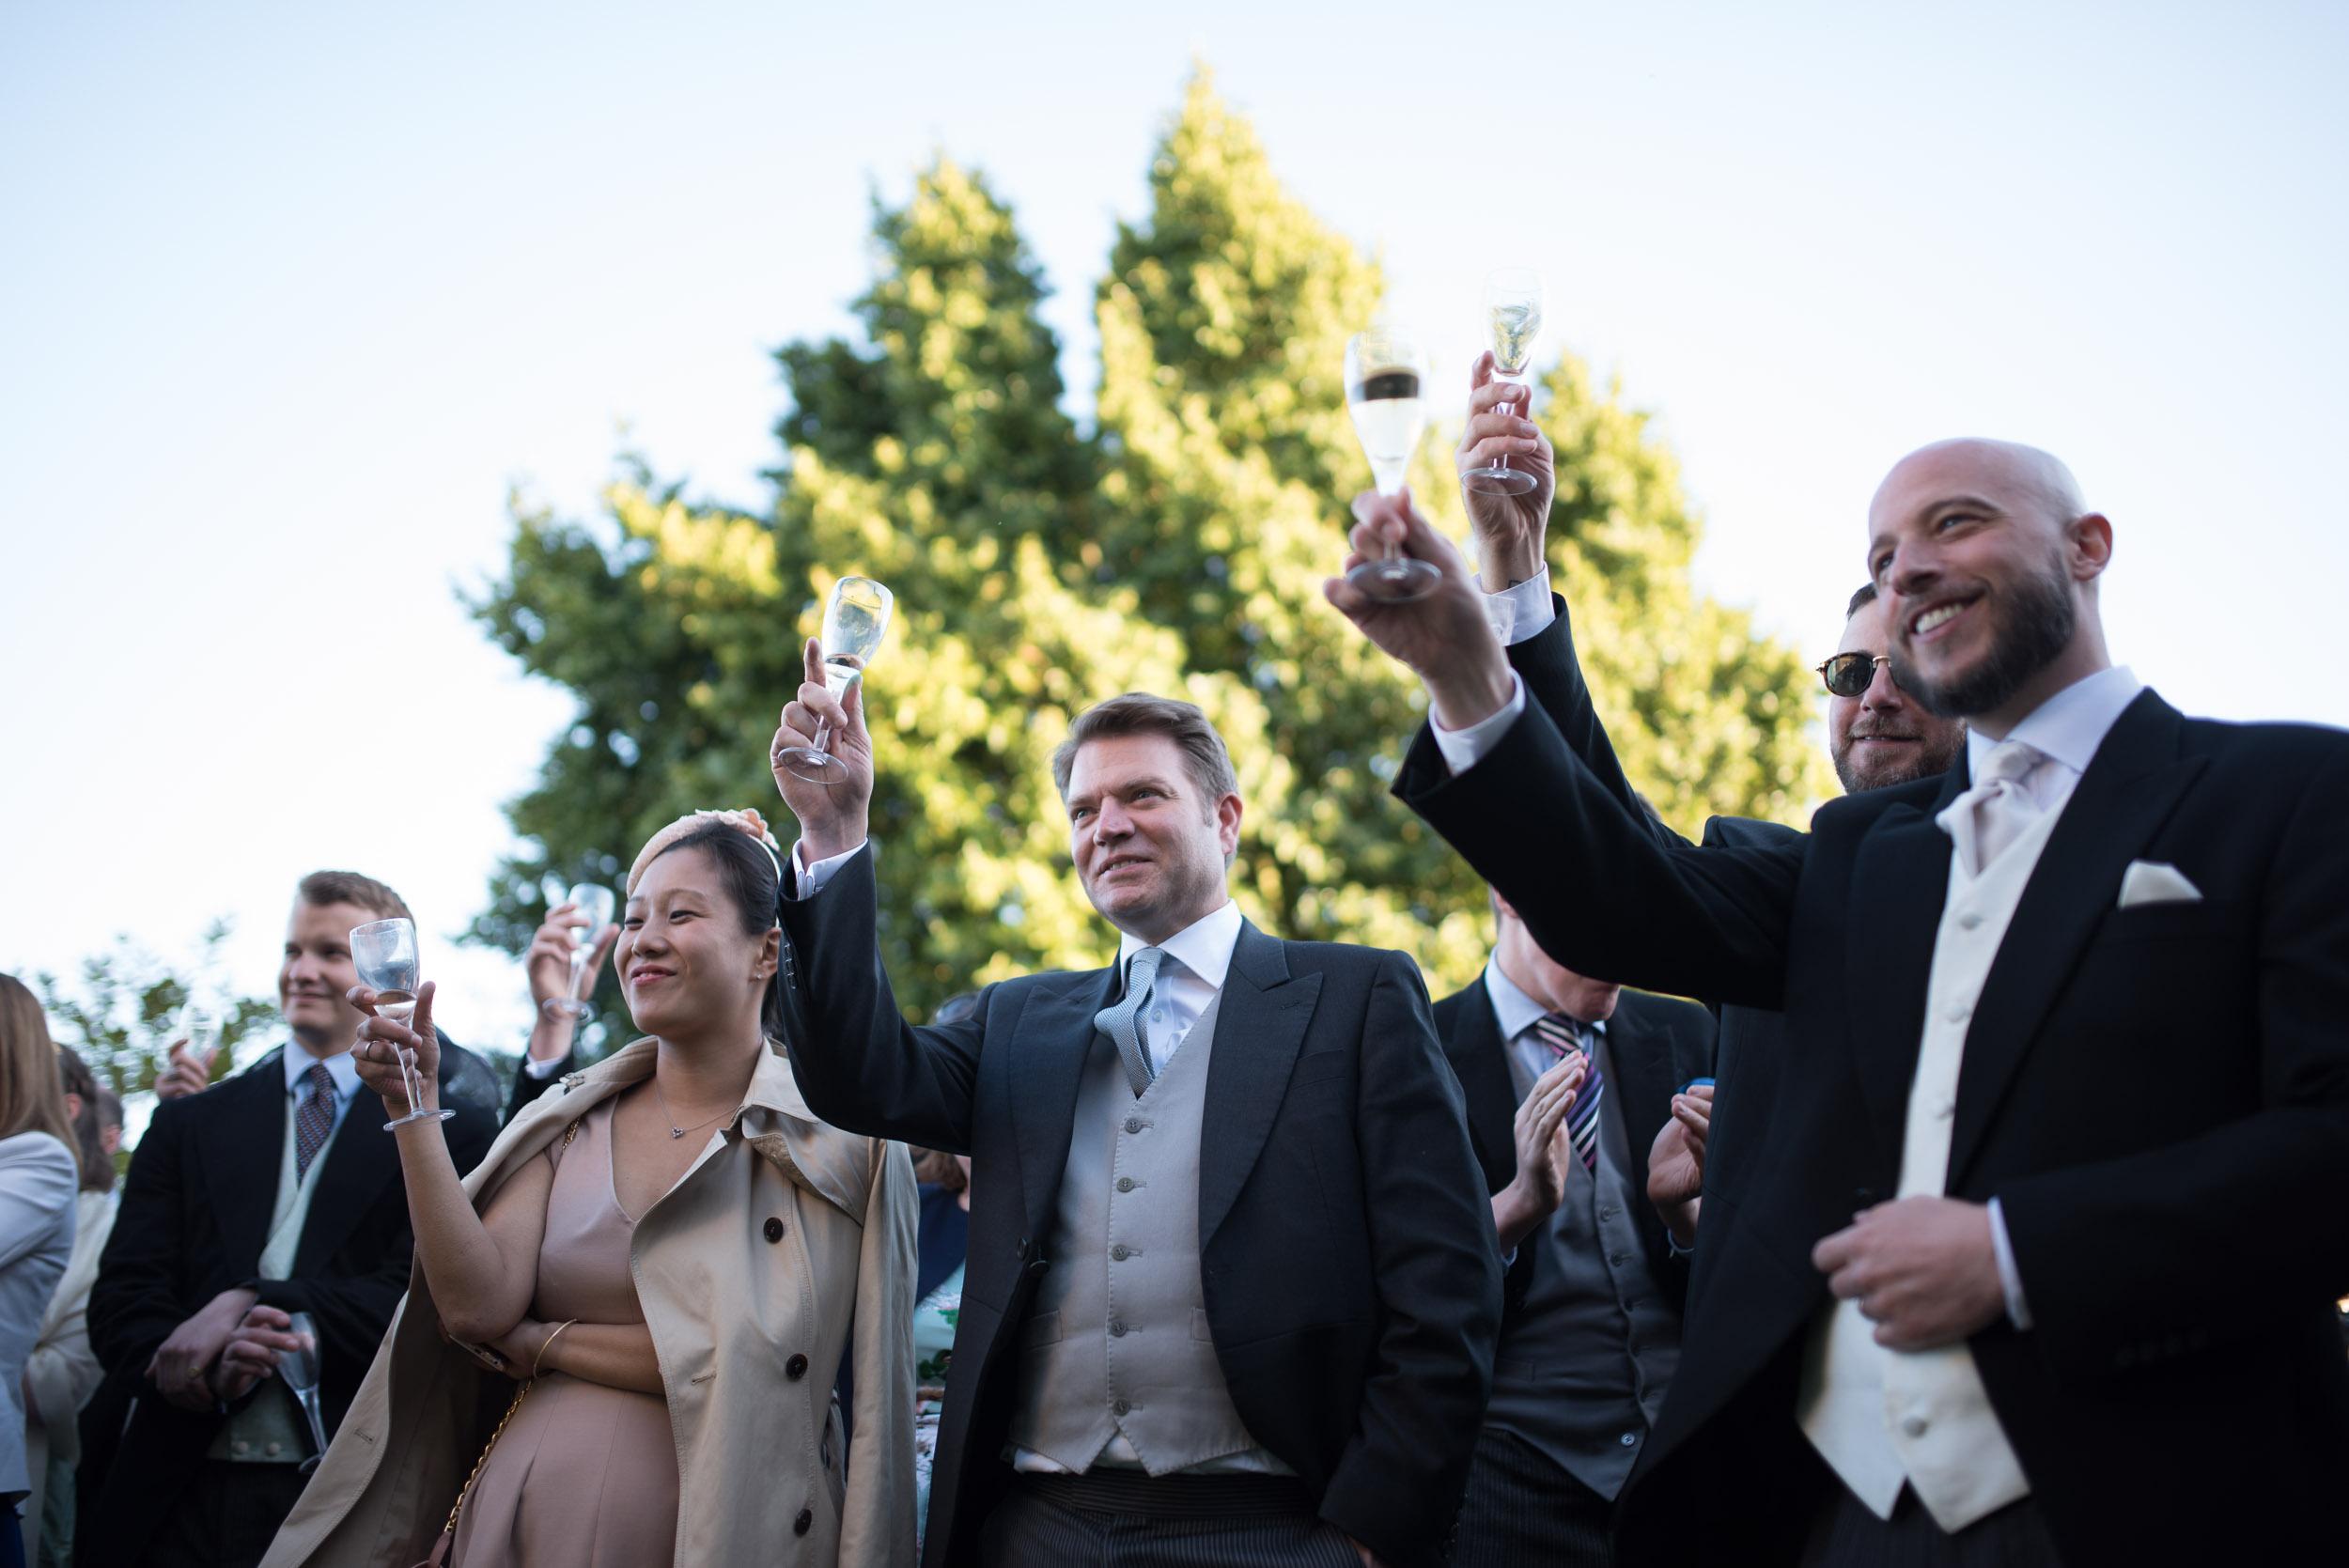 hamswell-house-wedding-photographer-w104.jpg